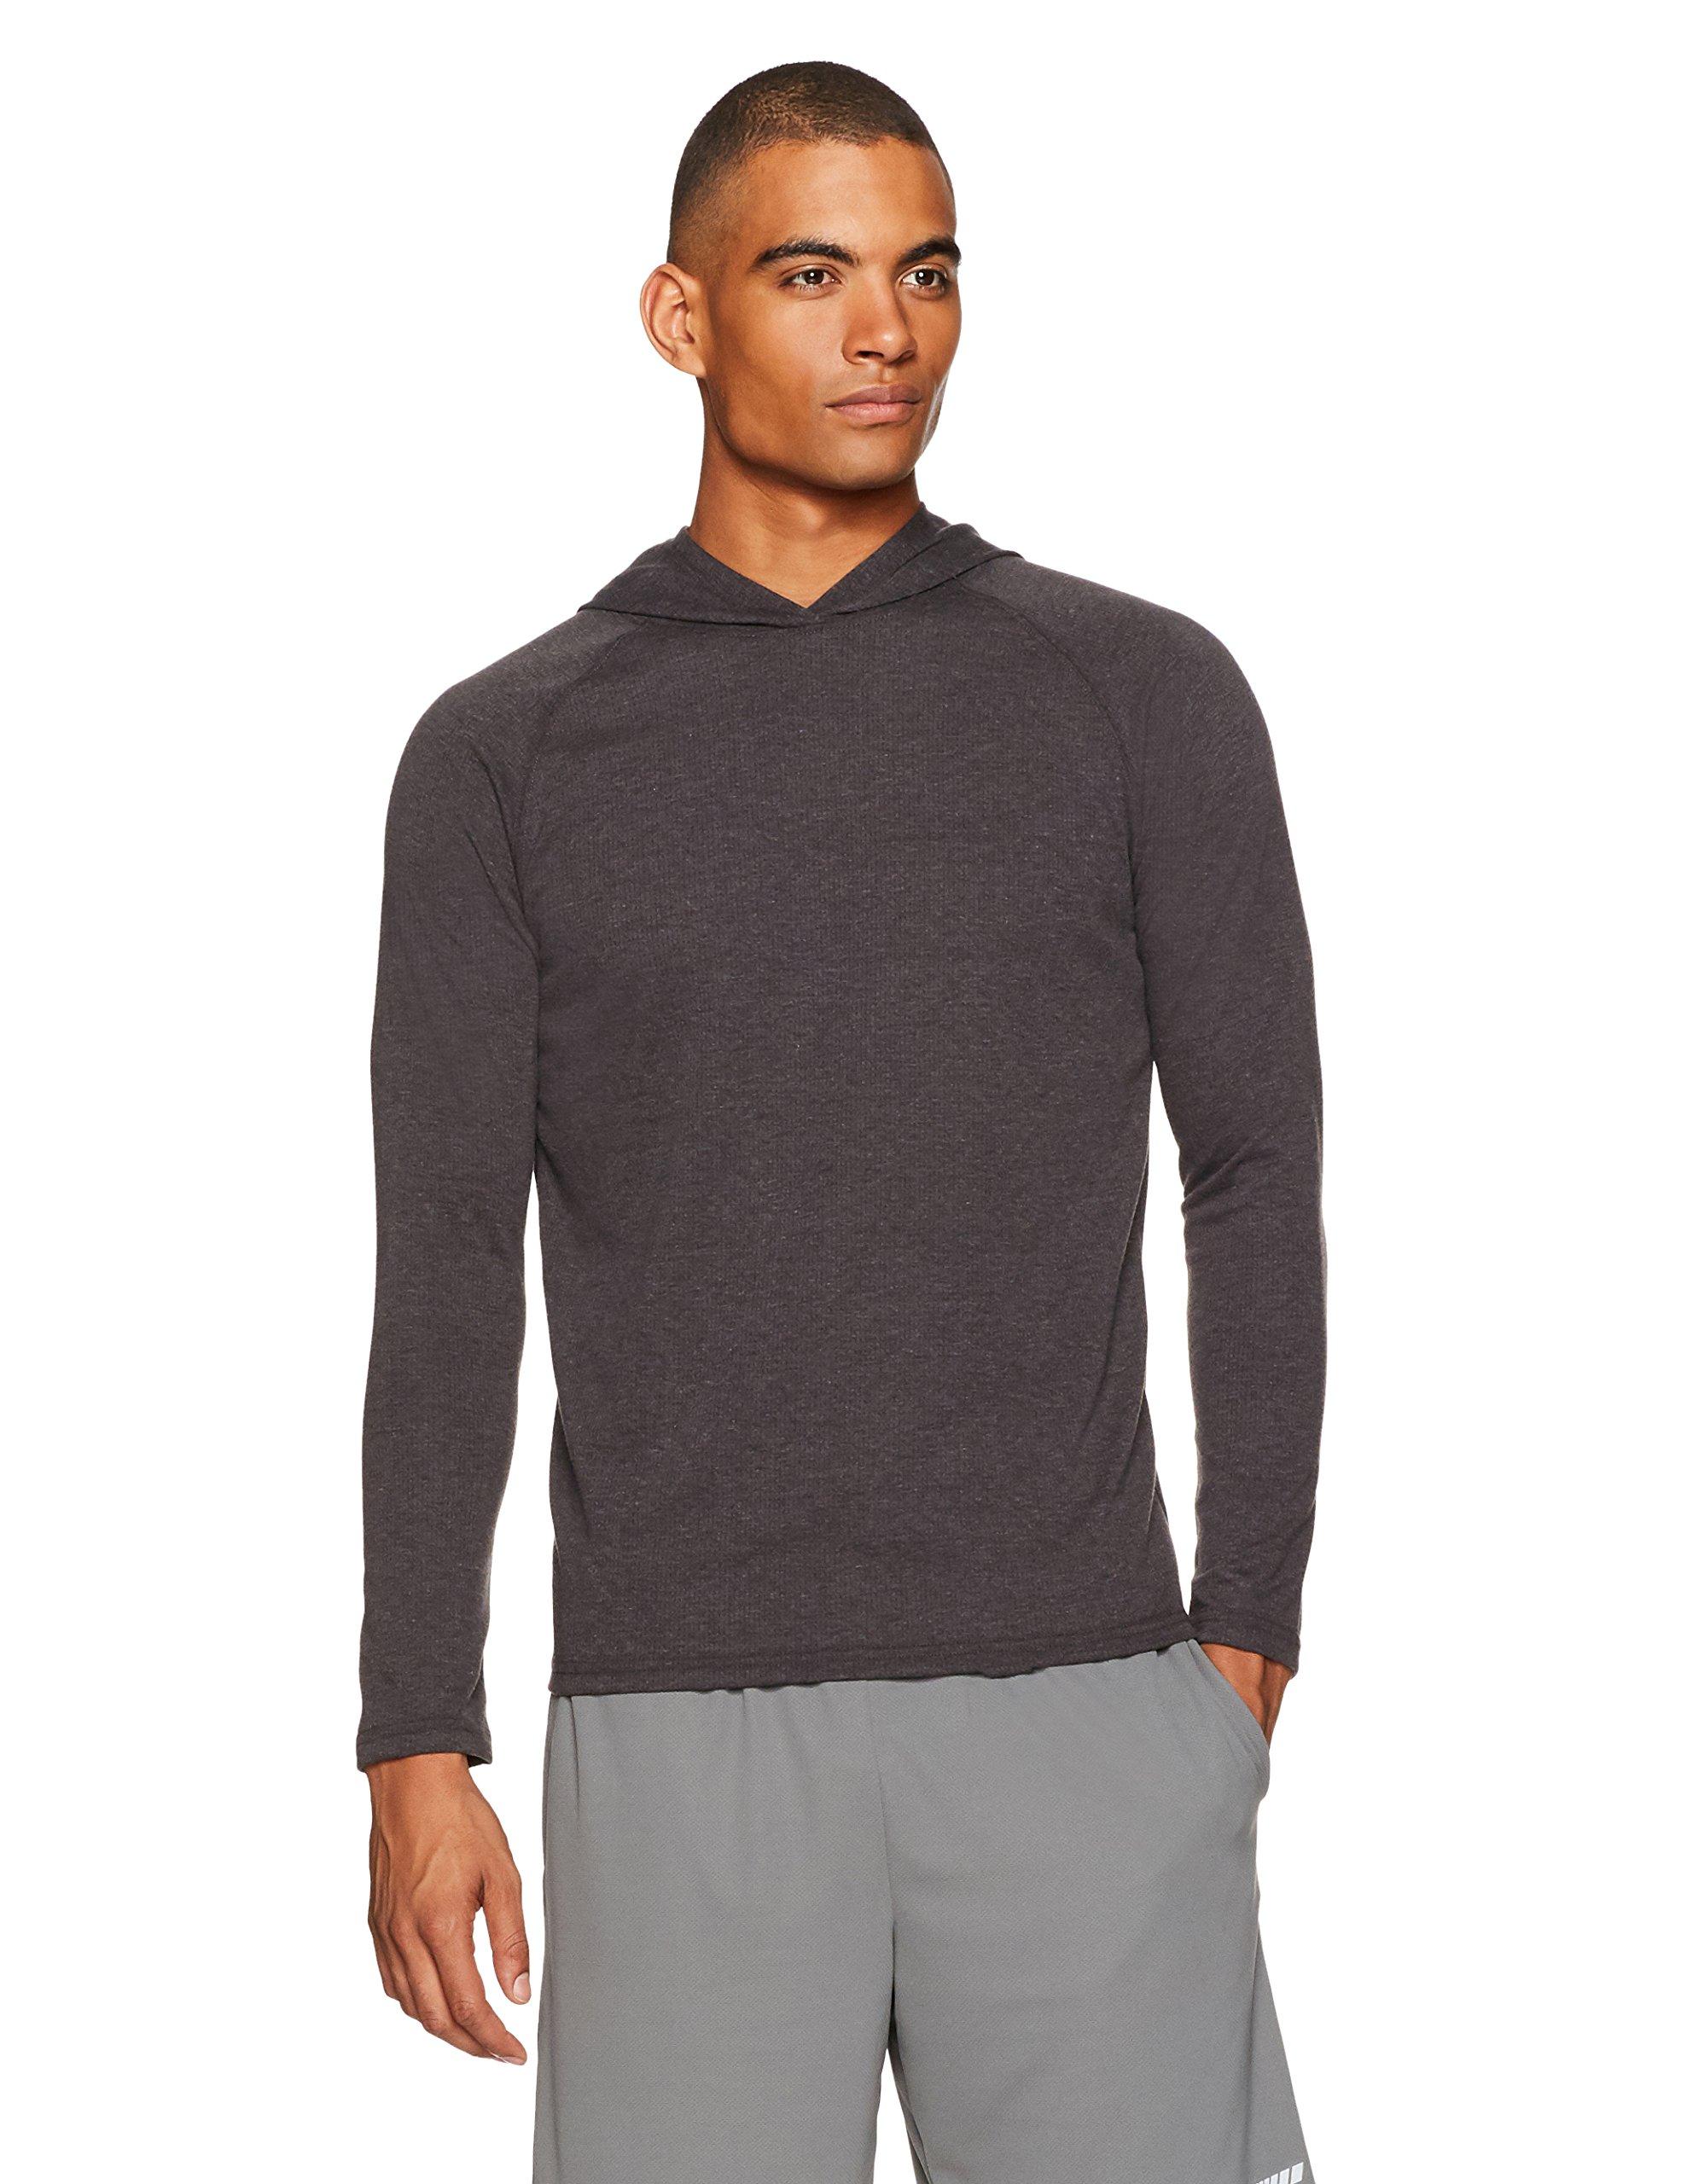 Fashion Shopping Amazon Essentials Men's Performance Hooded Shirt